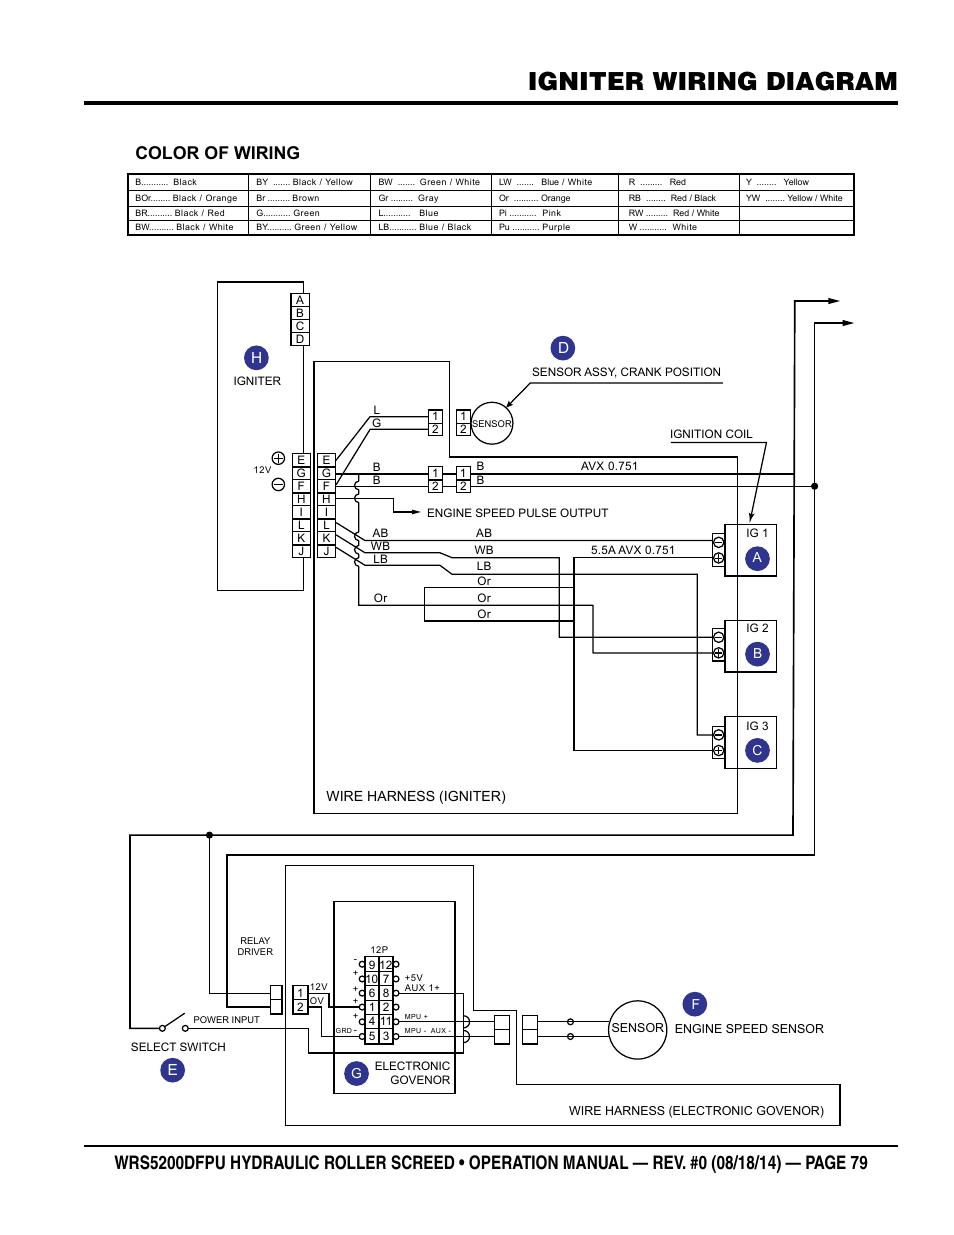 split ac wiring diagram hd emg hz les paul dual fuel library igniter color of e multiquip wrs5200dfpu kubota wg972